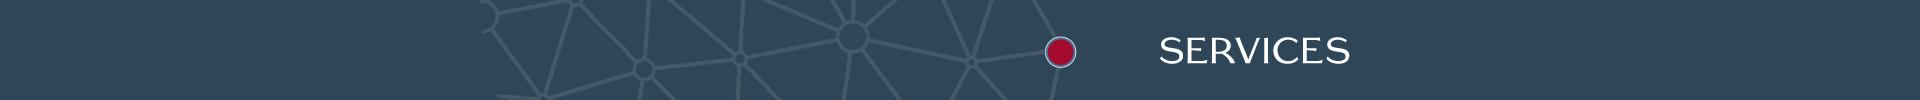 Slider_Services-new